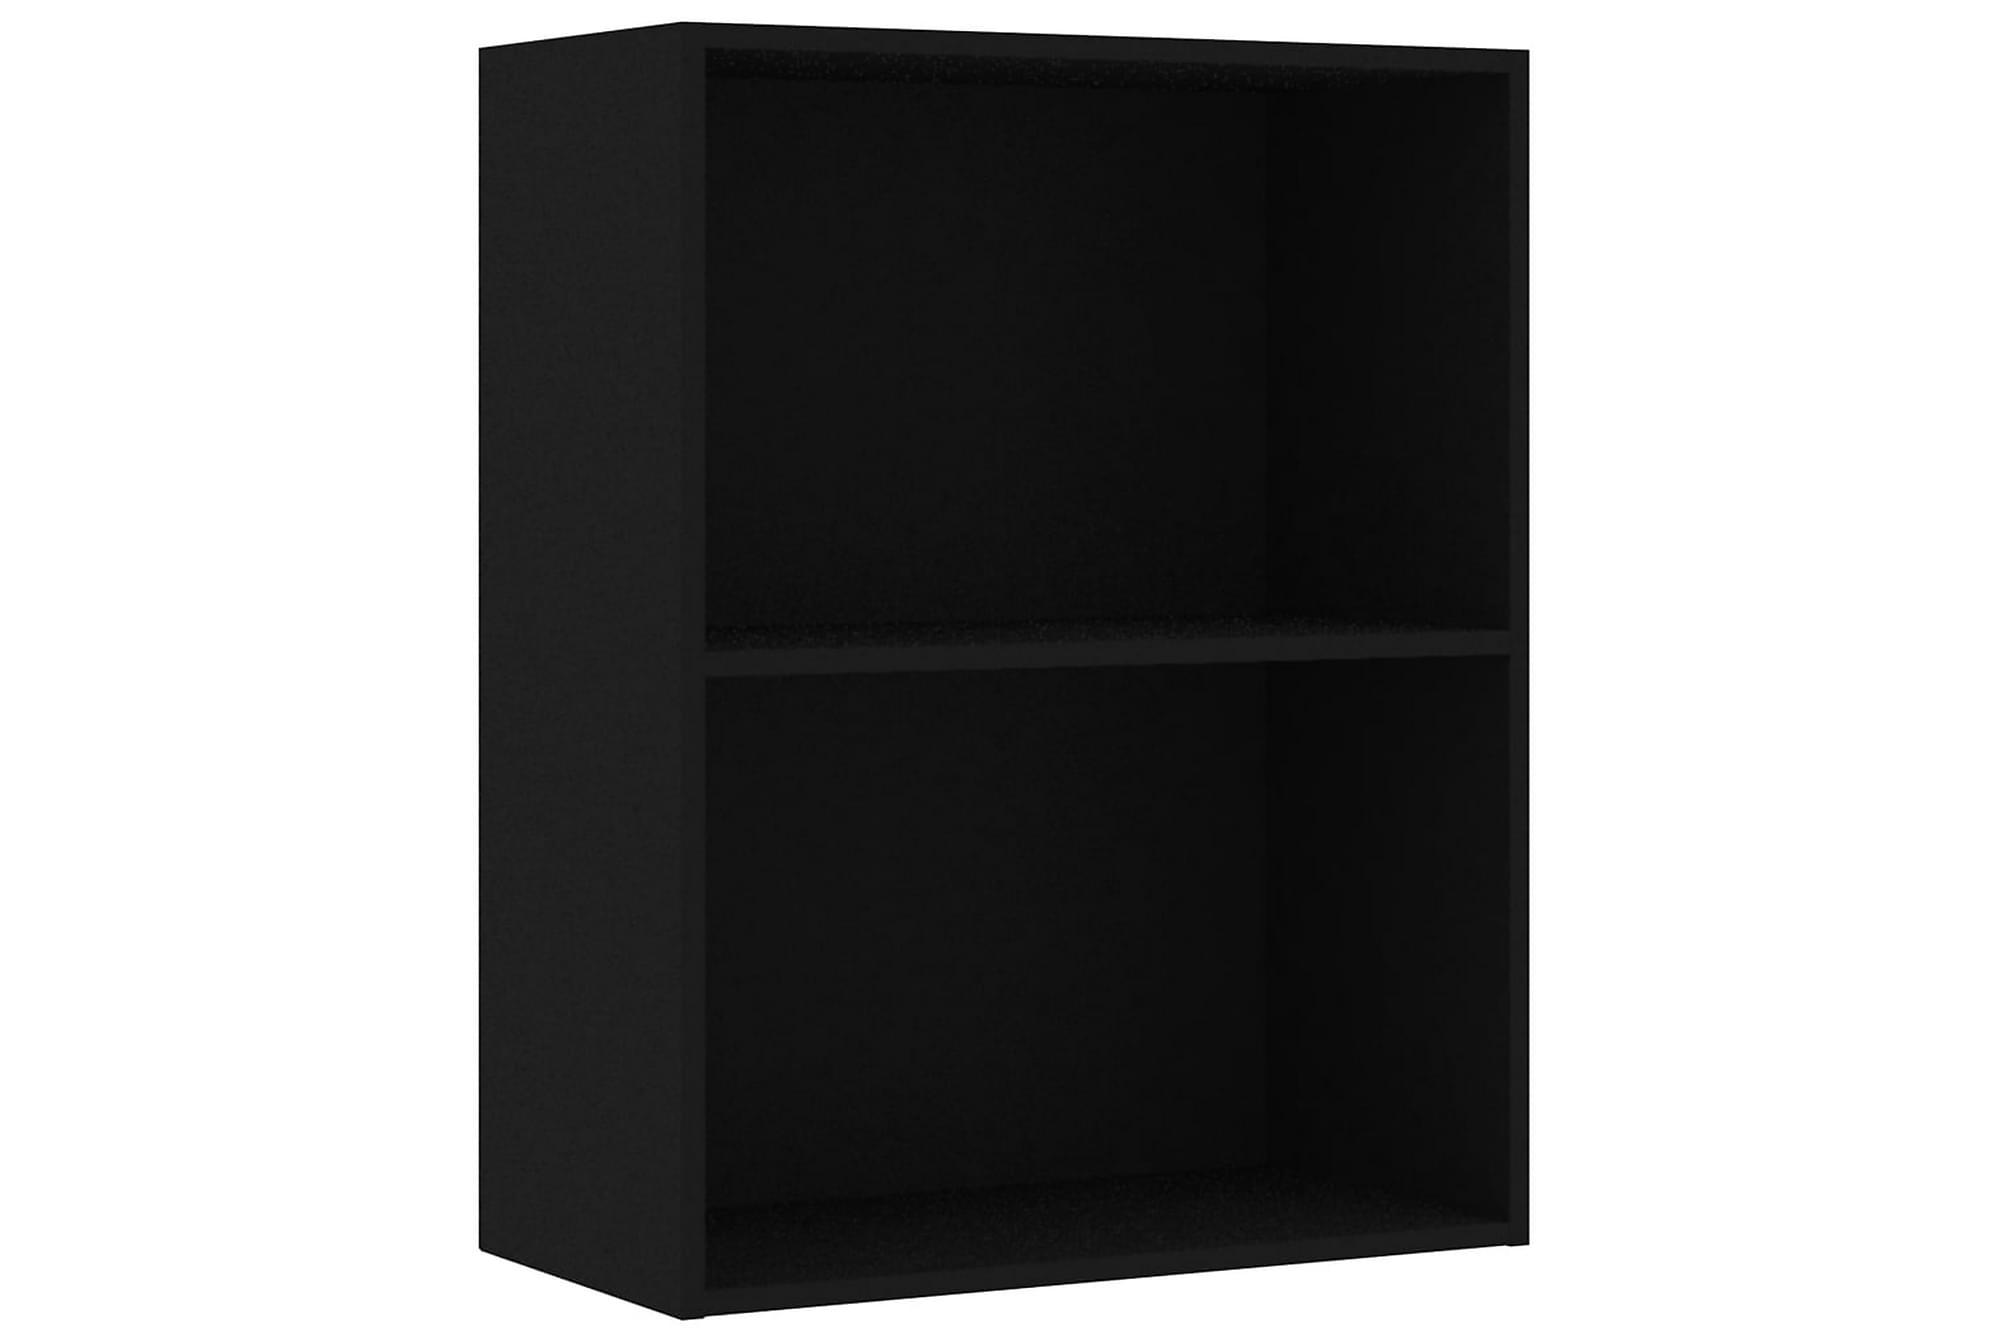 Bokhylla 2 hyllor svart 60x30x76,5 cm spånskiva